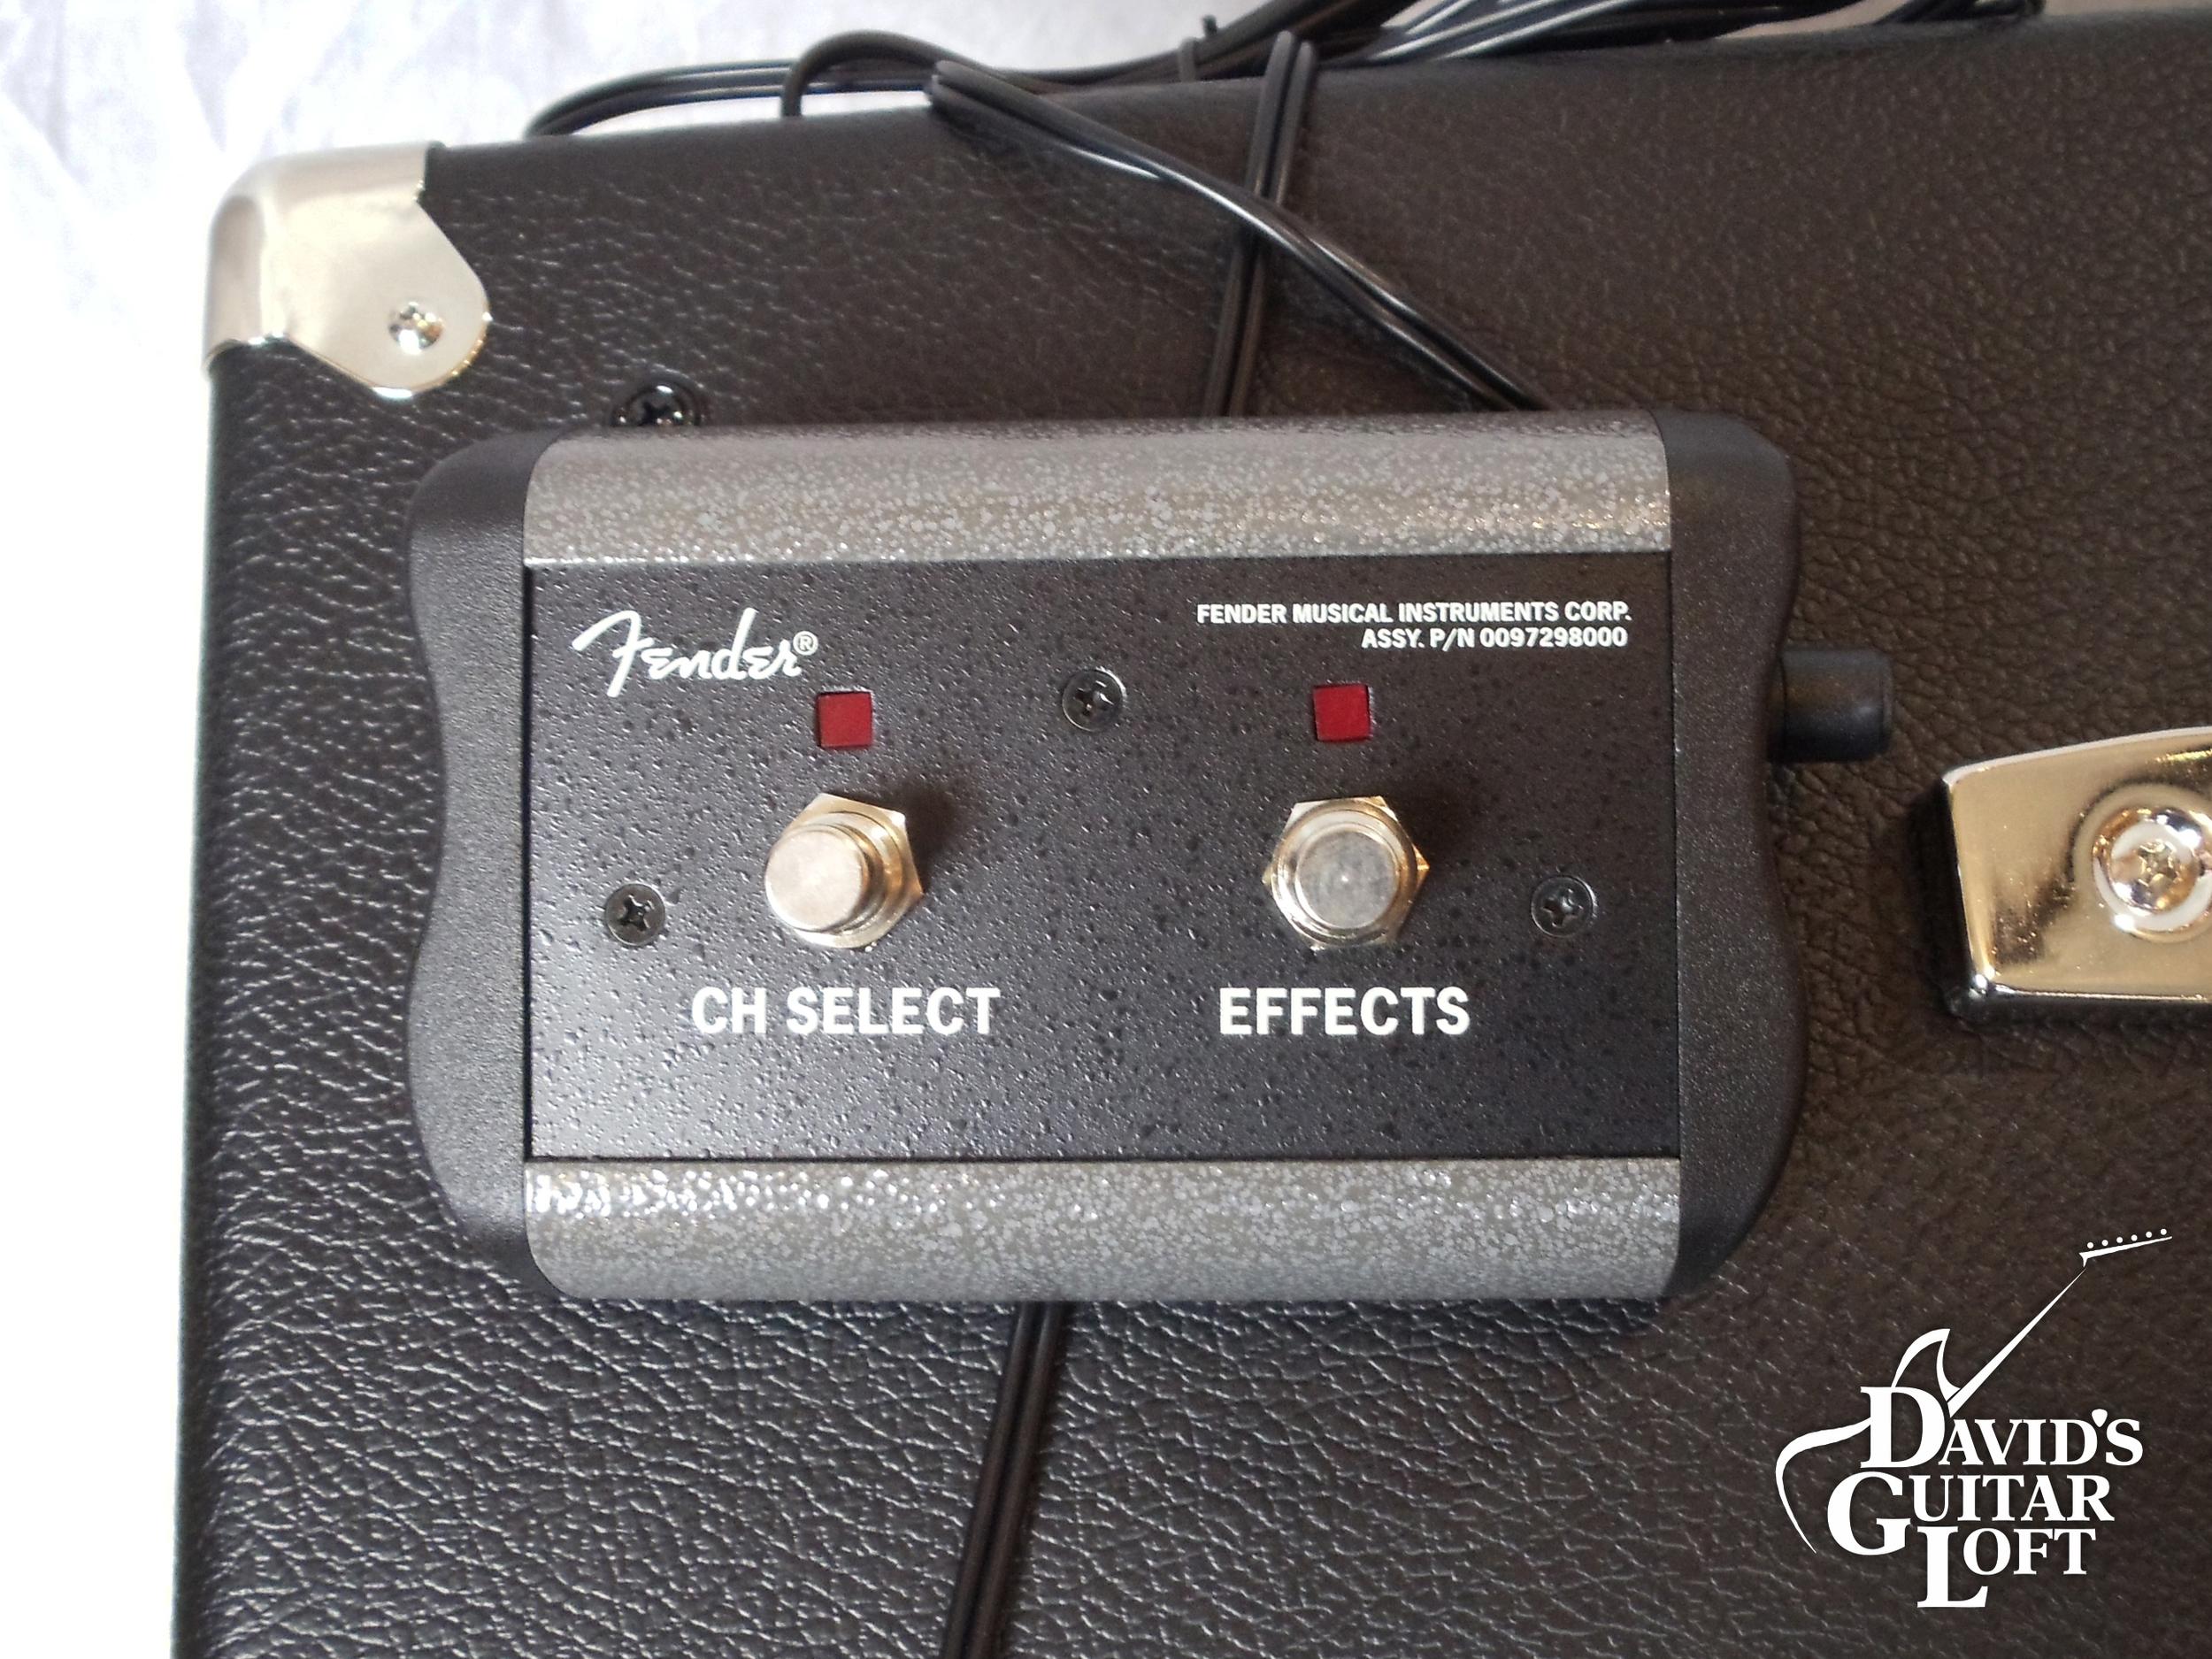 Fender Champion 100 Amplifier — David's Guitar Loft - Sales, Music Lessons,  and Instrument Repair